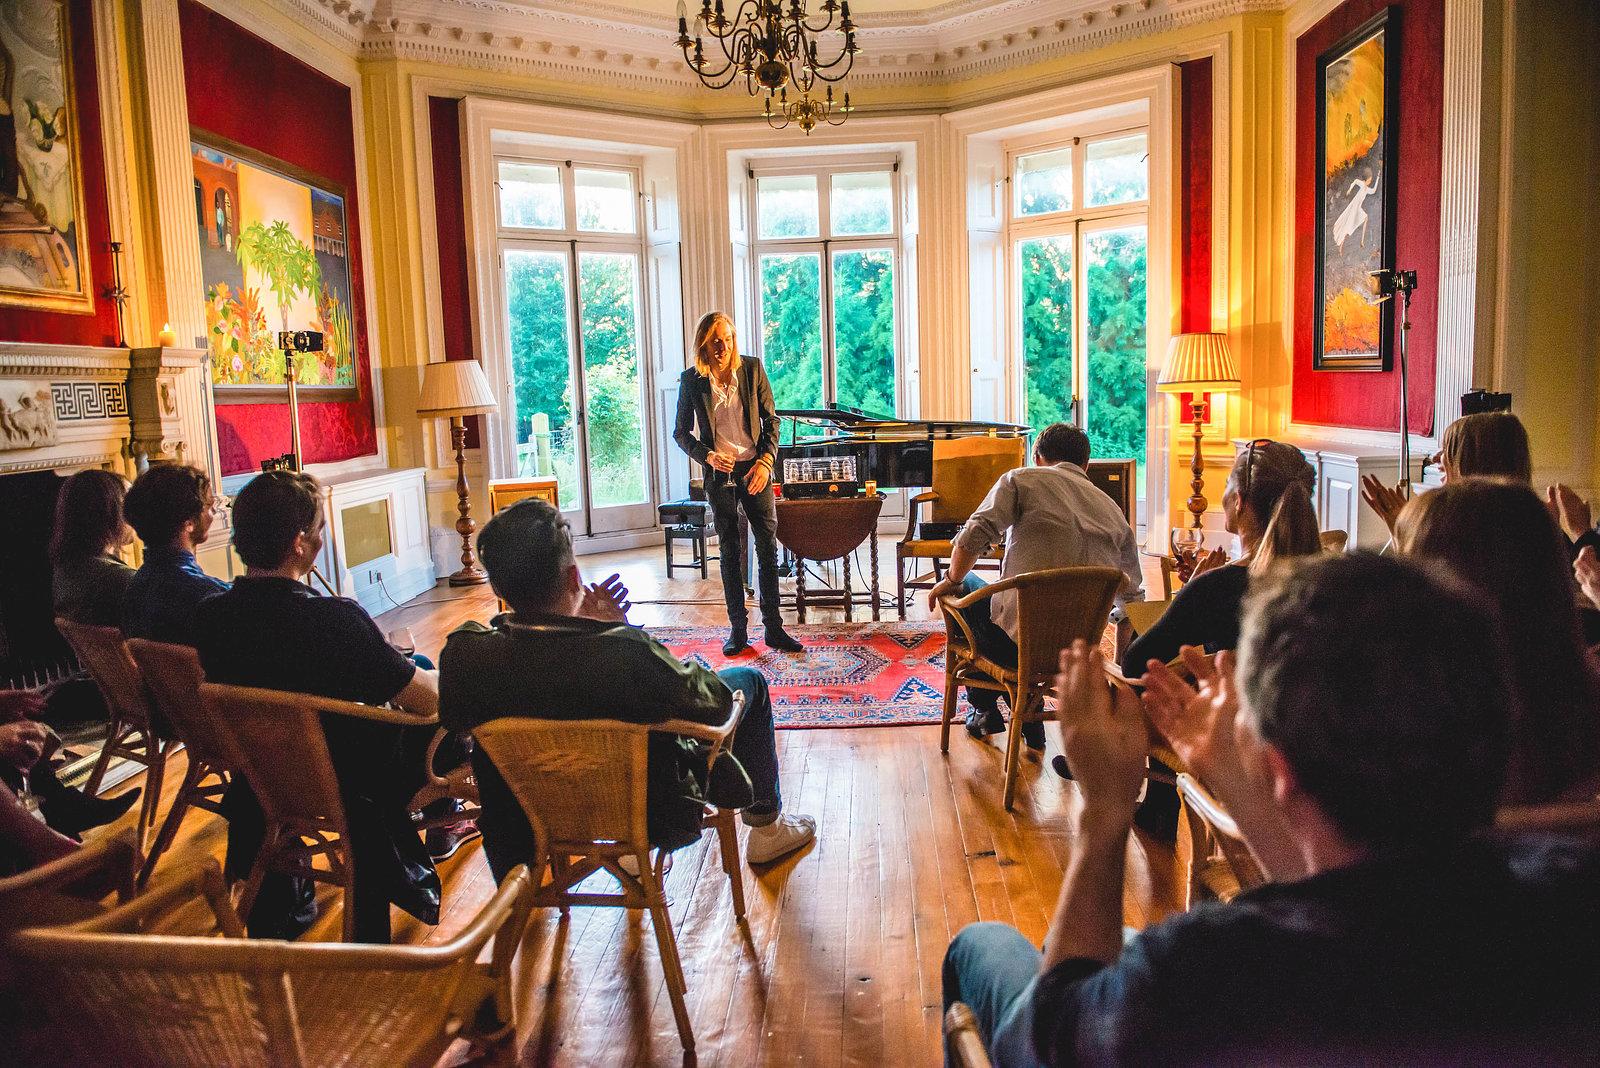 St Leonard's Horses album playback at Stanley Kubrick's Estate, July 2016